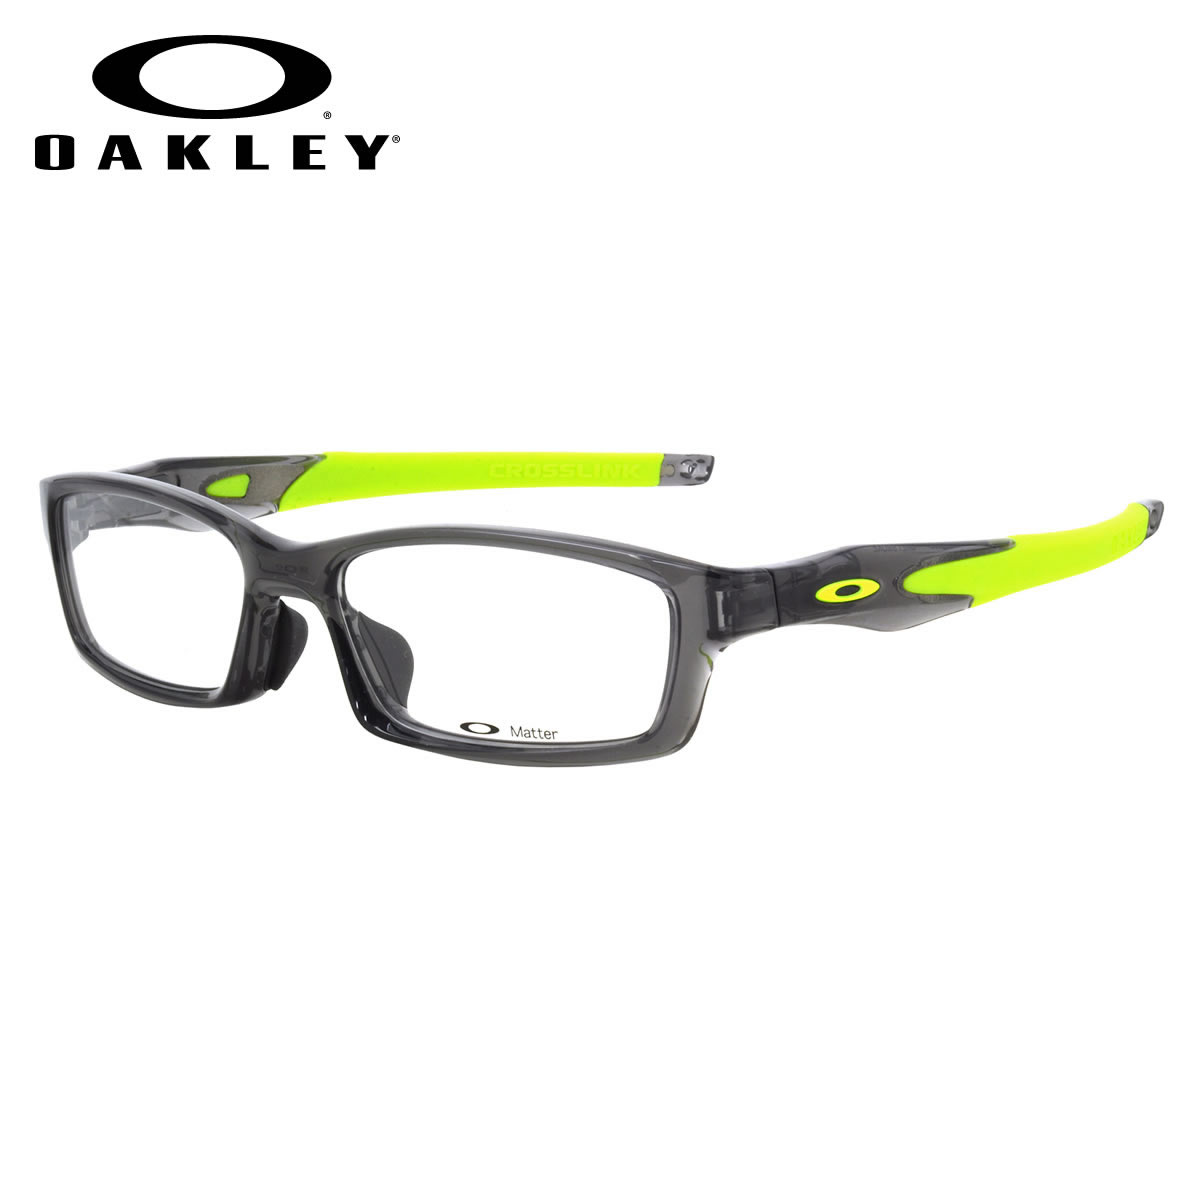 676b5b78a035 ... shopping oakley glasses ox8029 0256 crosslink asia fit grey smoke  retina burn cross linked asian fit